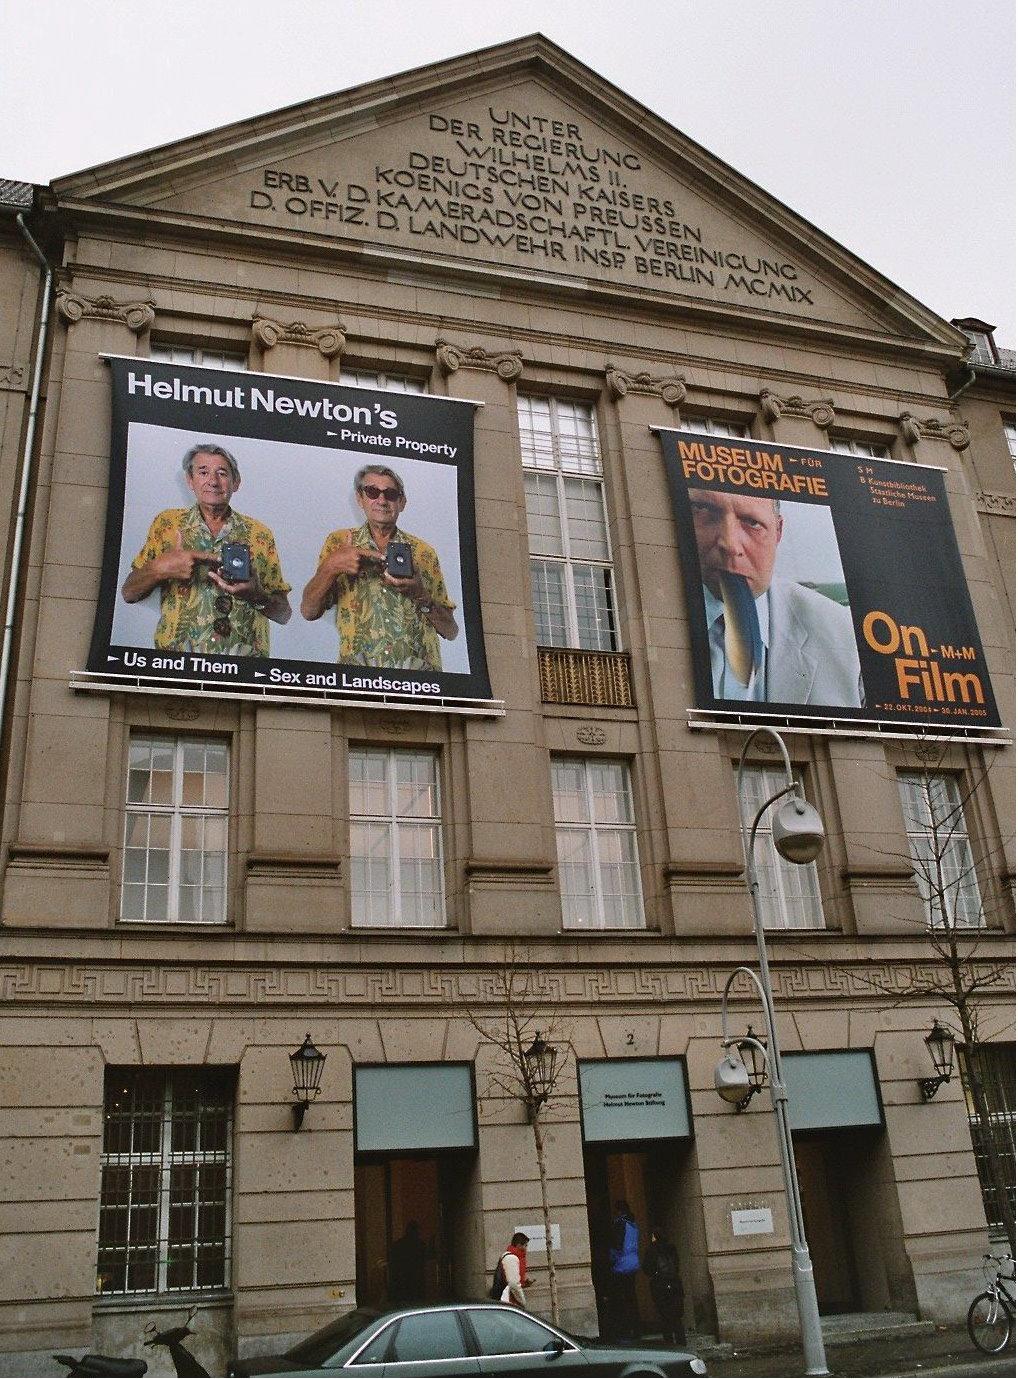 Helmut Newton Stiftung